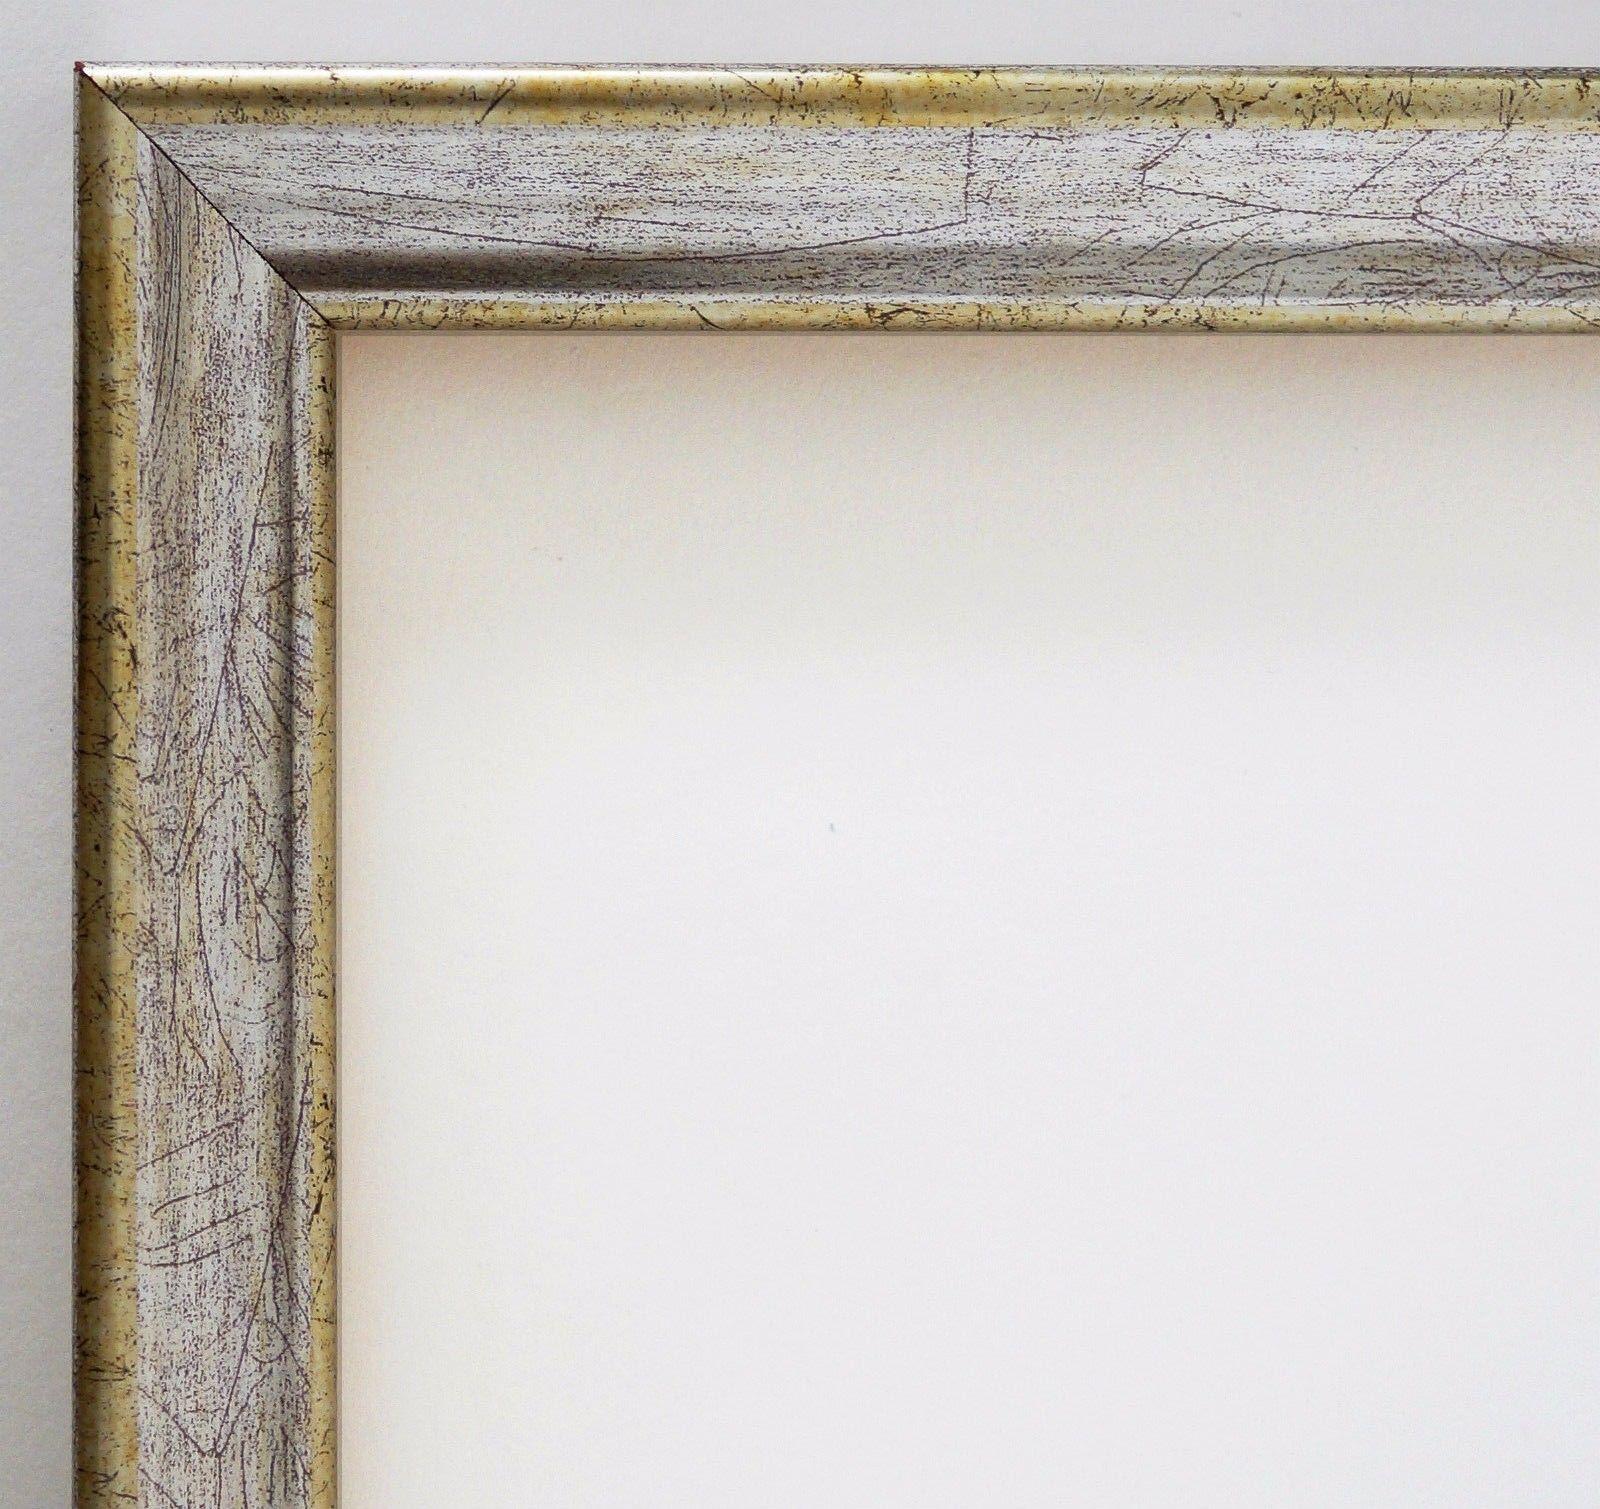 Bilderrahmen Silber Antik Shabby Rahmen Holz Klassisch Kiel 2, 3 ...